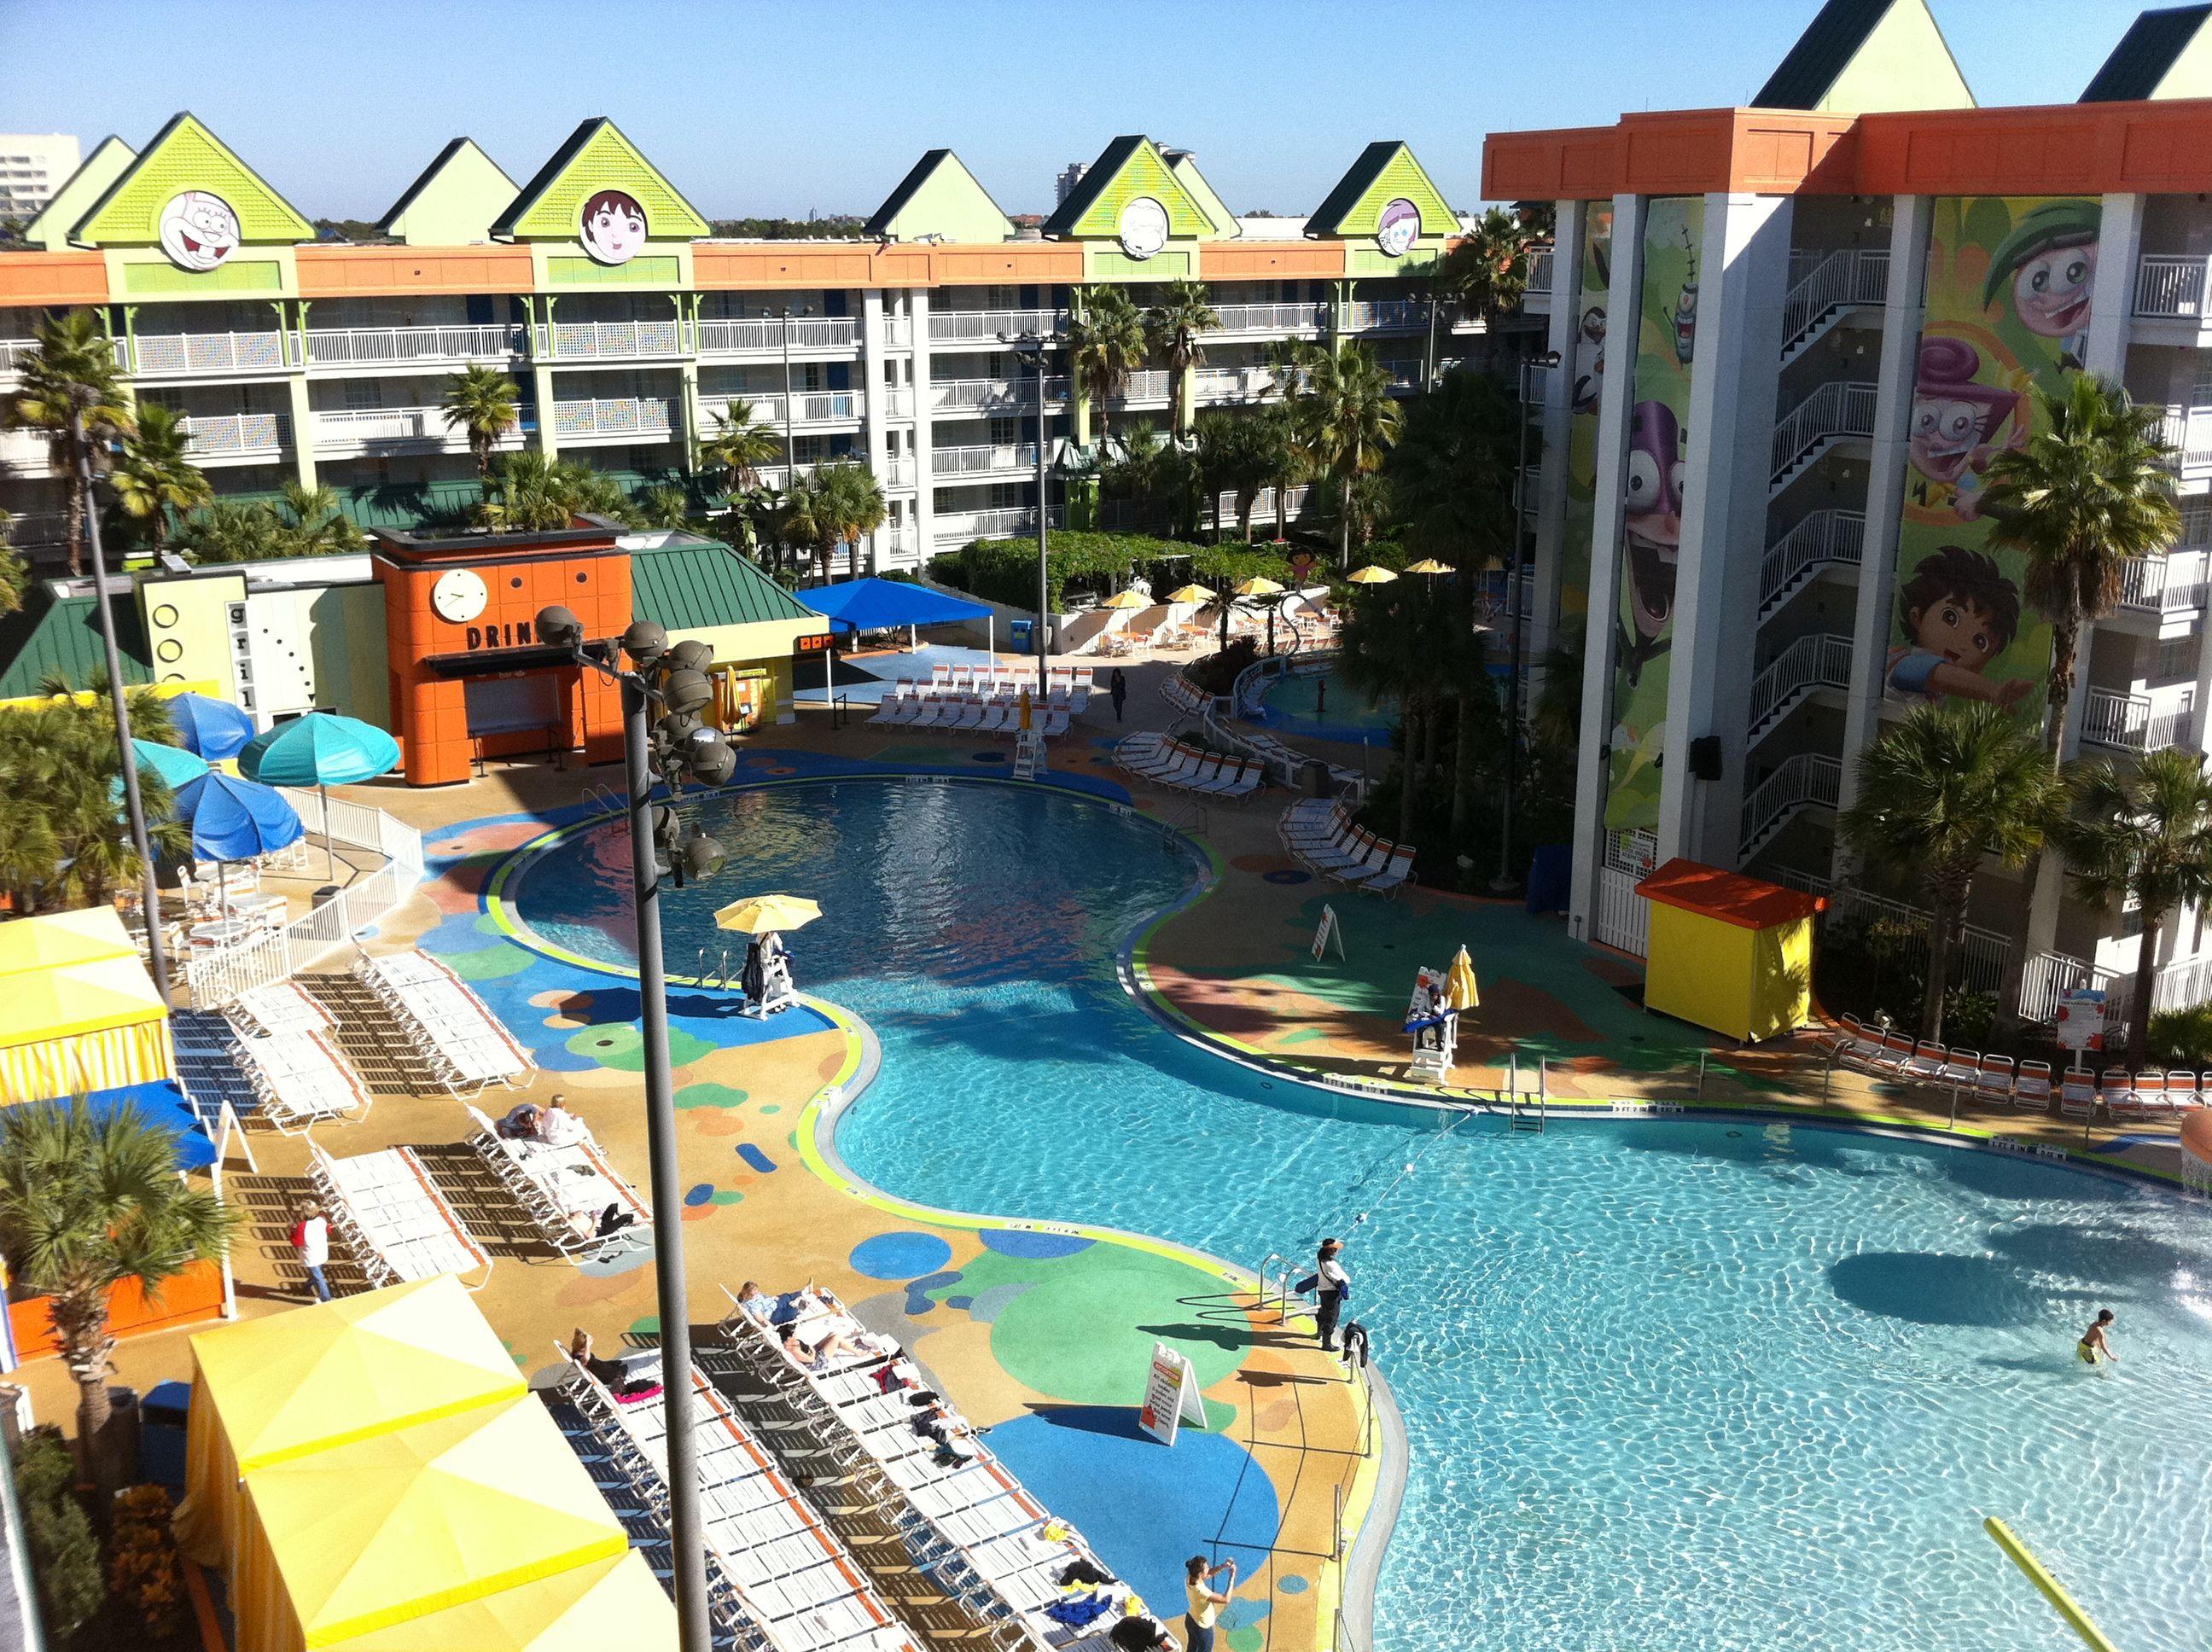 Nickelodeon Hotel Orlando Exciting Pinterest Cruise Ships - Nickelodeon cruise ships